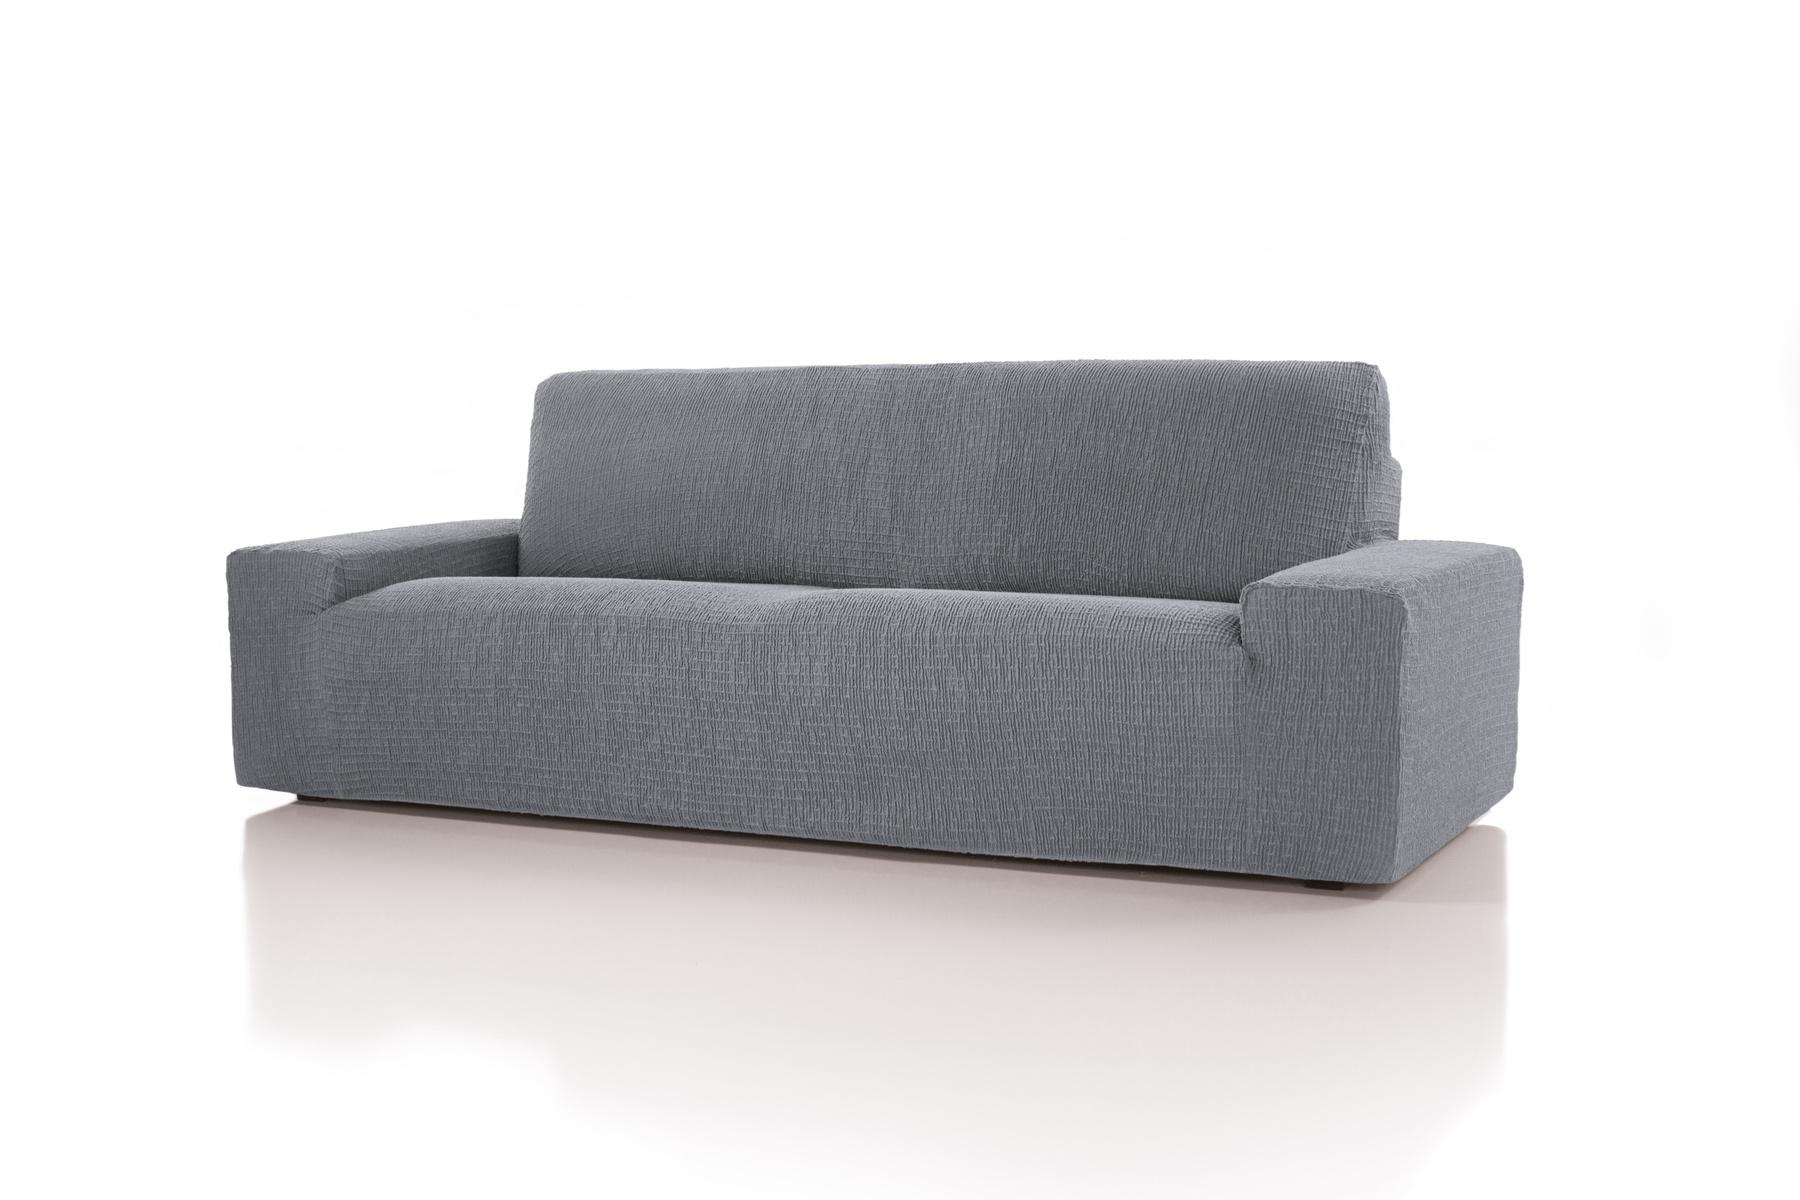 Forbyt, Potah multielastický, Cagliari, šedý křeslo, 70 - 110 cm